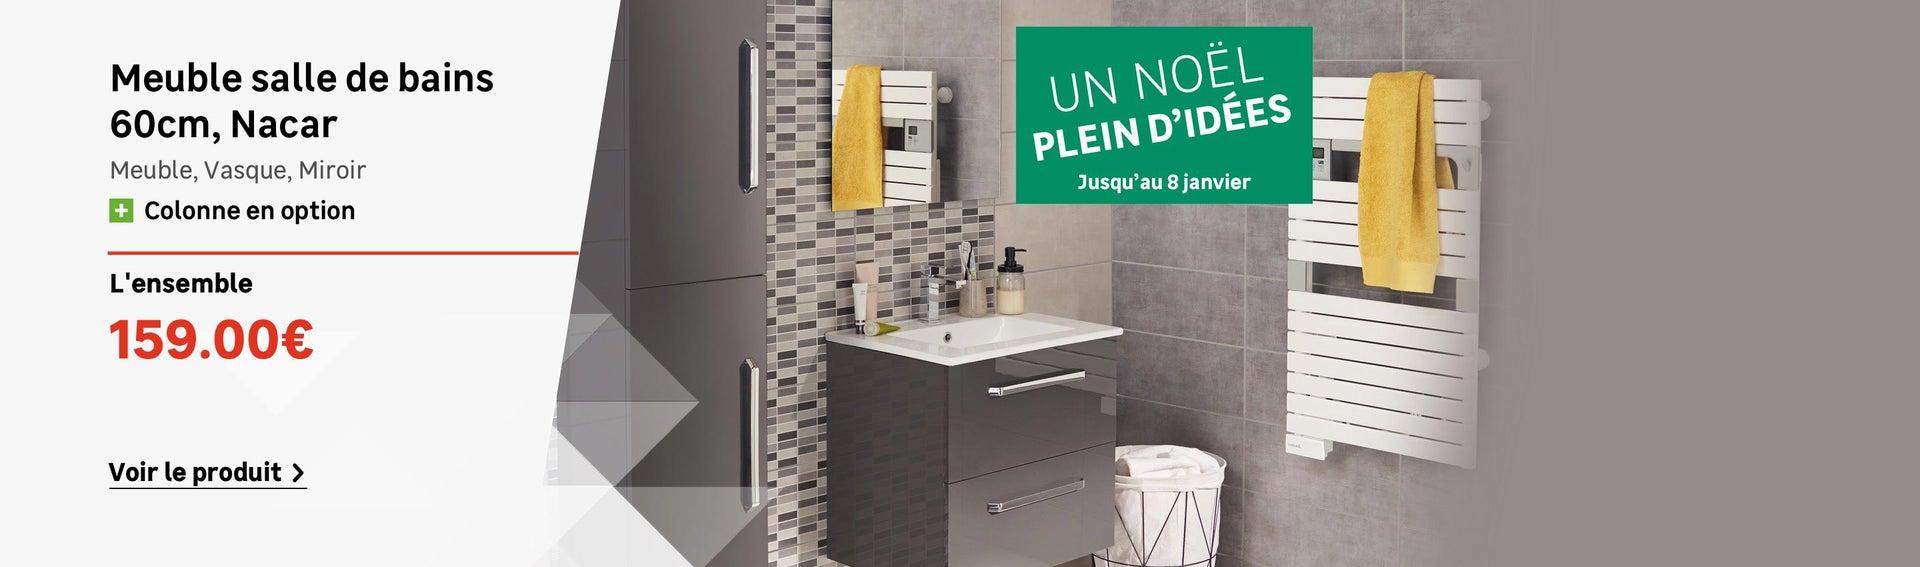 Meuble salle de bain et vasque leroy merlin for Robinet de salle de bain leroy merlin